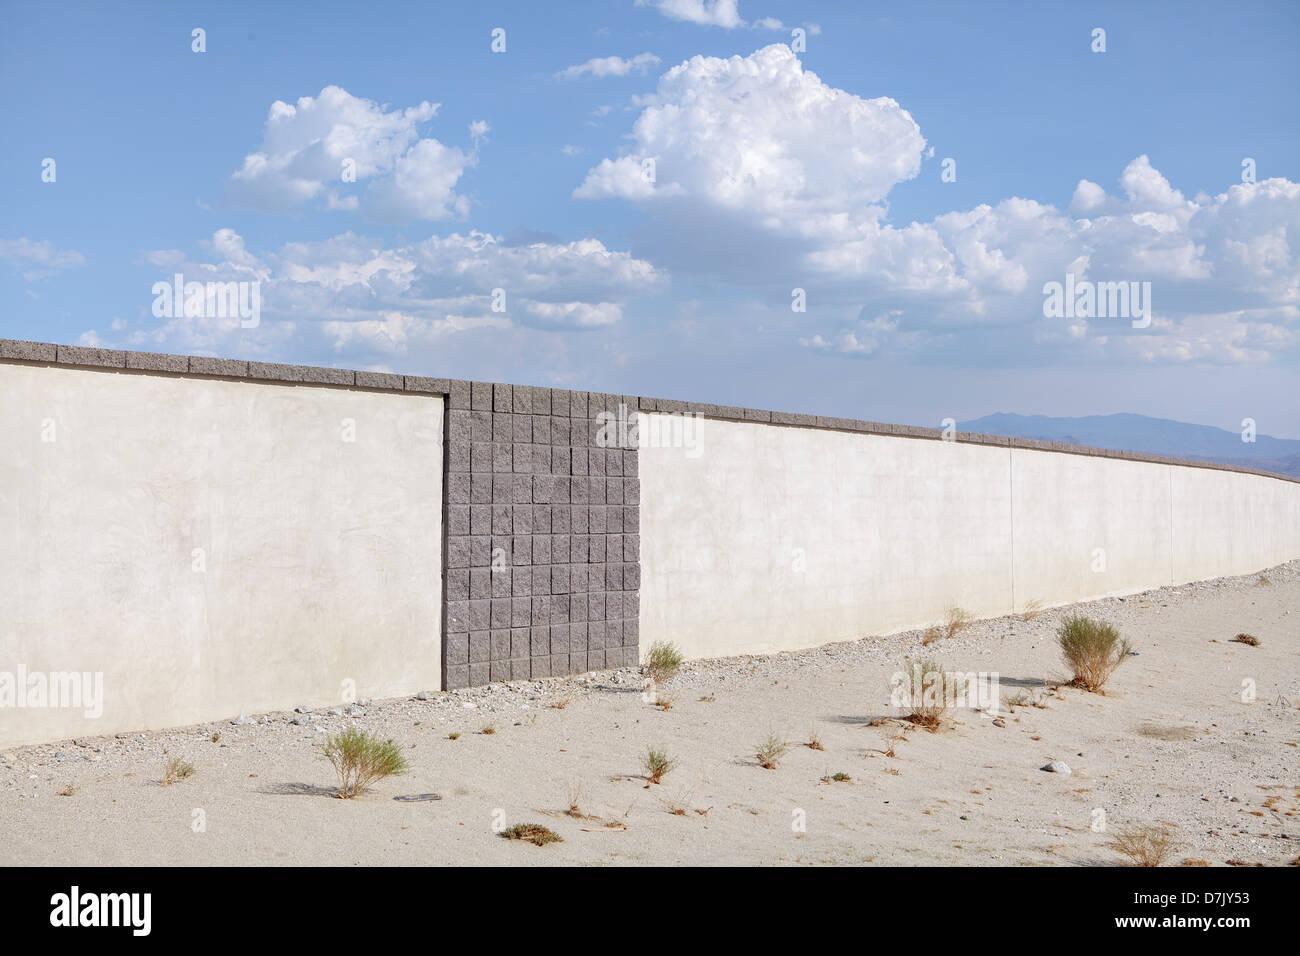 White walls against blue sky - Stock Image